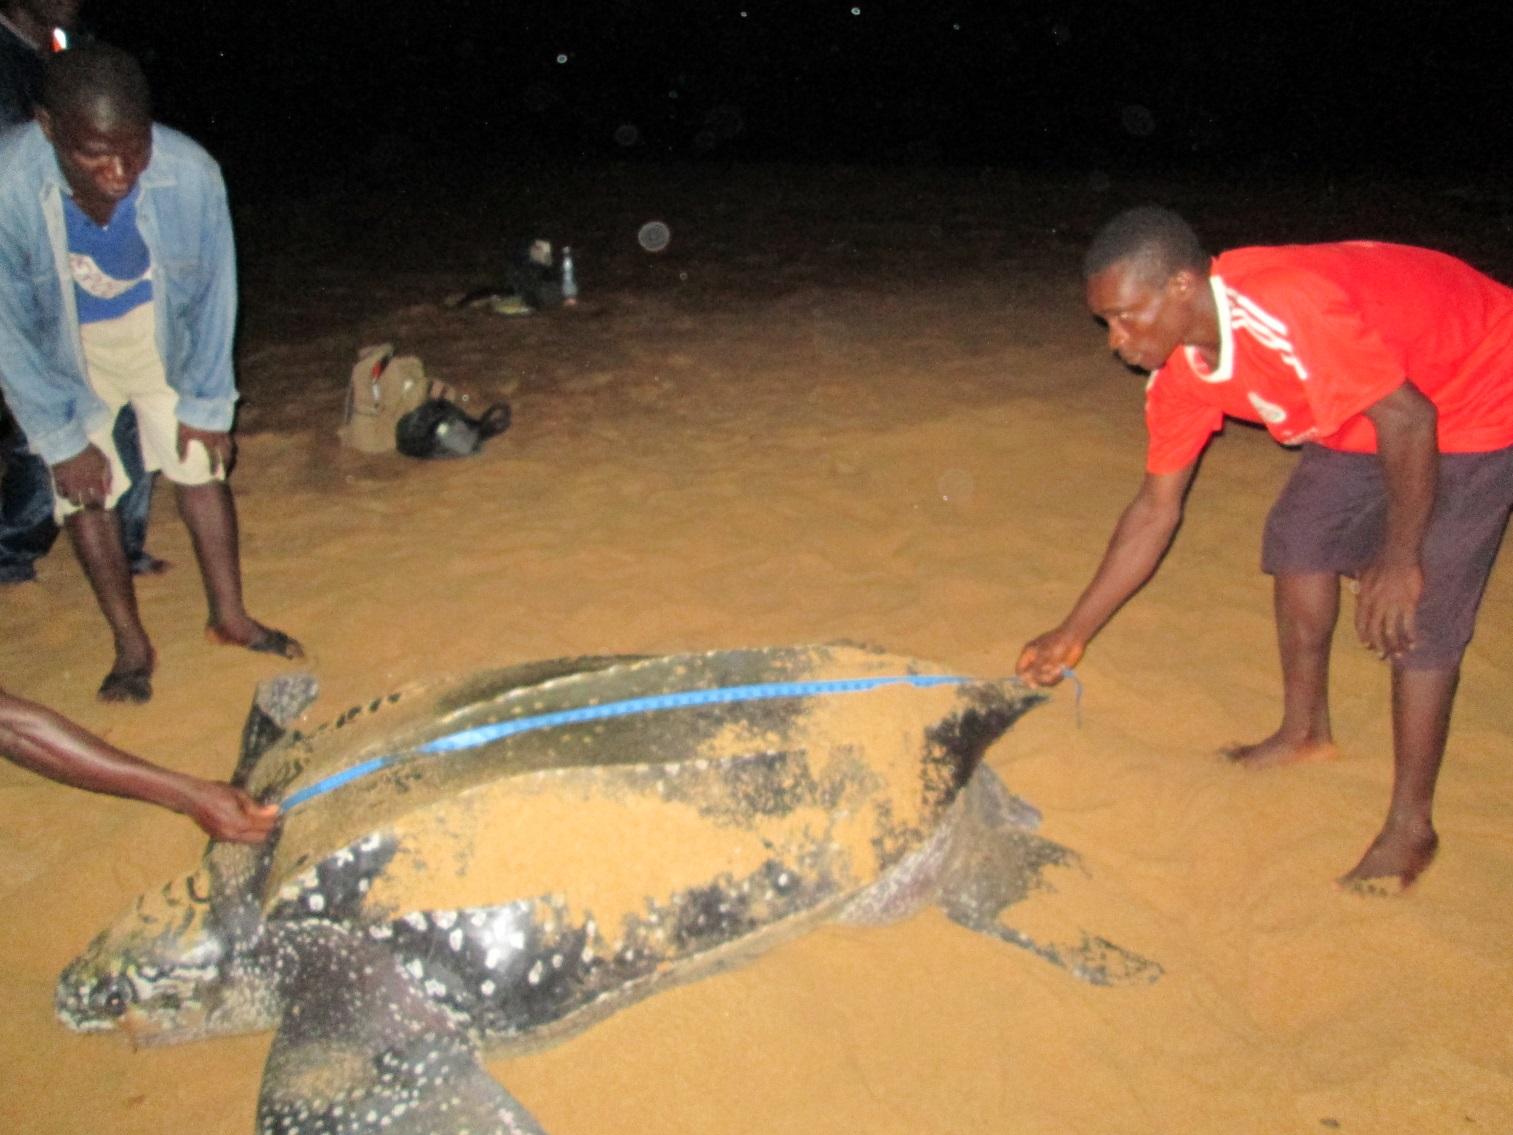 Lederschildkröte (Dermochelys coriacea)wird vermessen